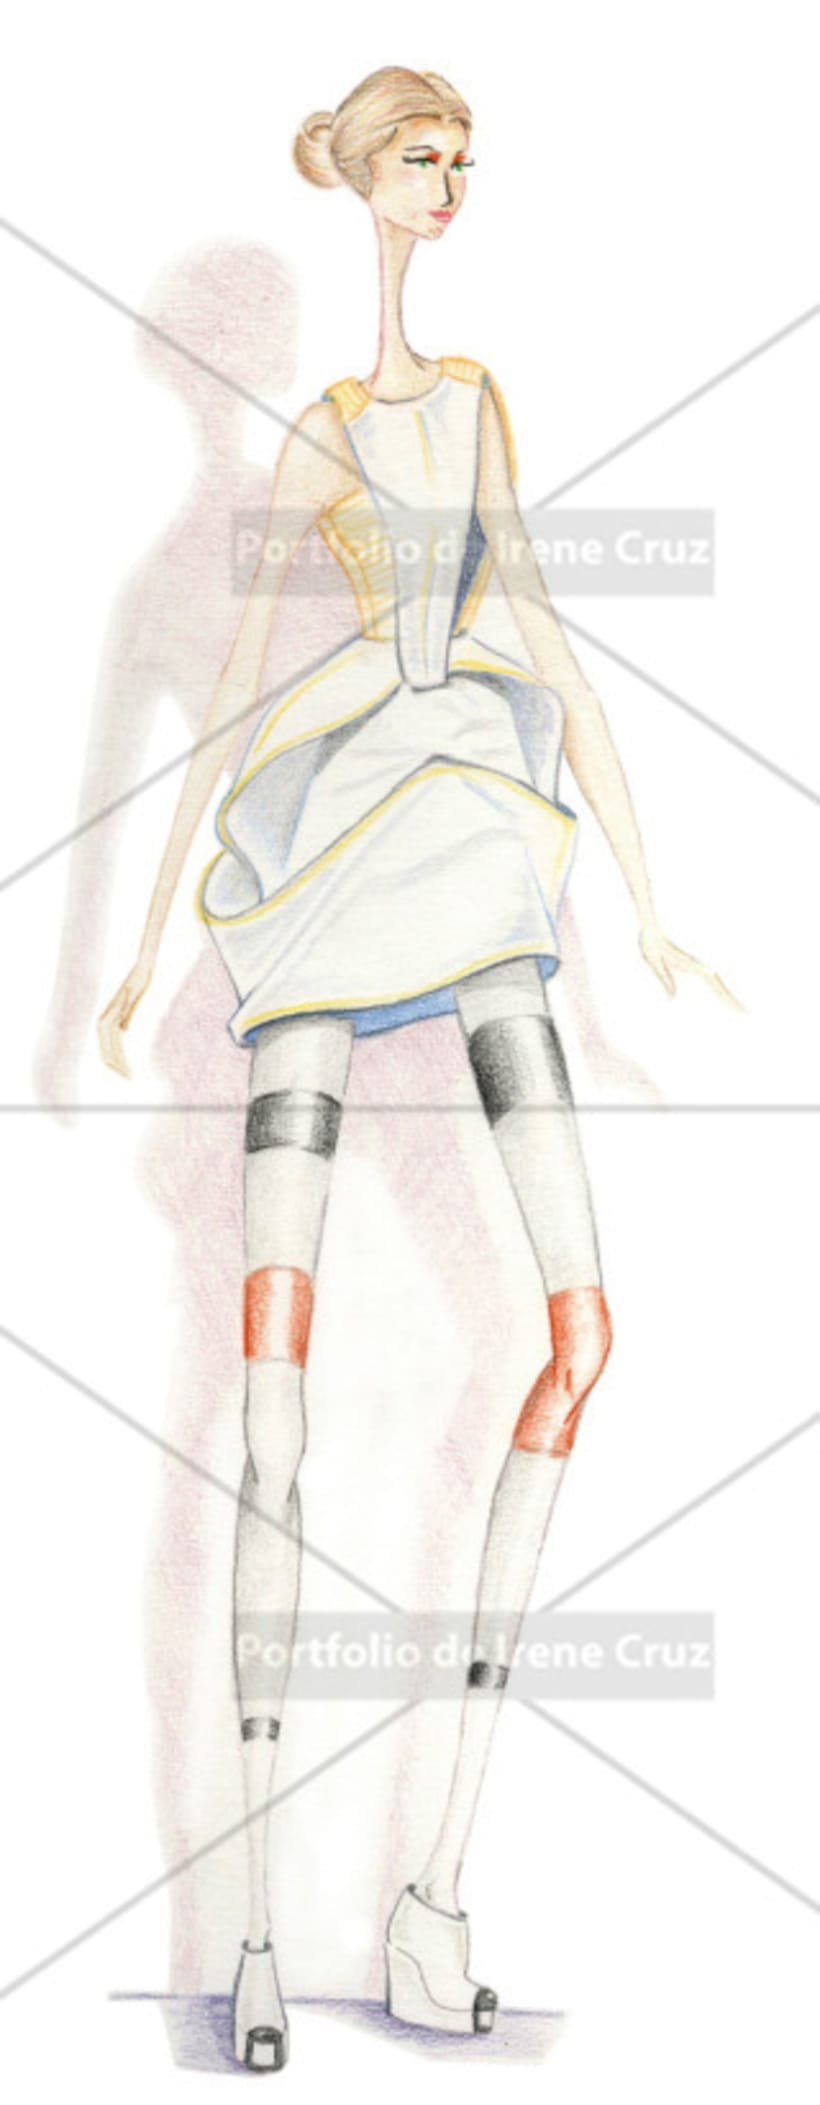 Illustrations 7